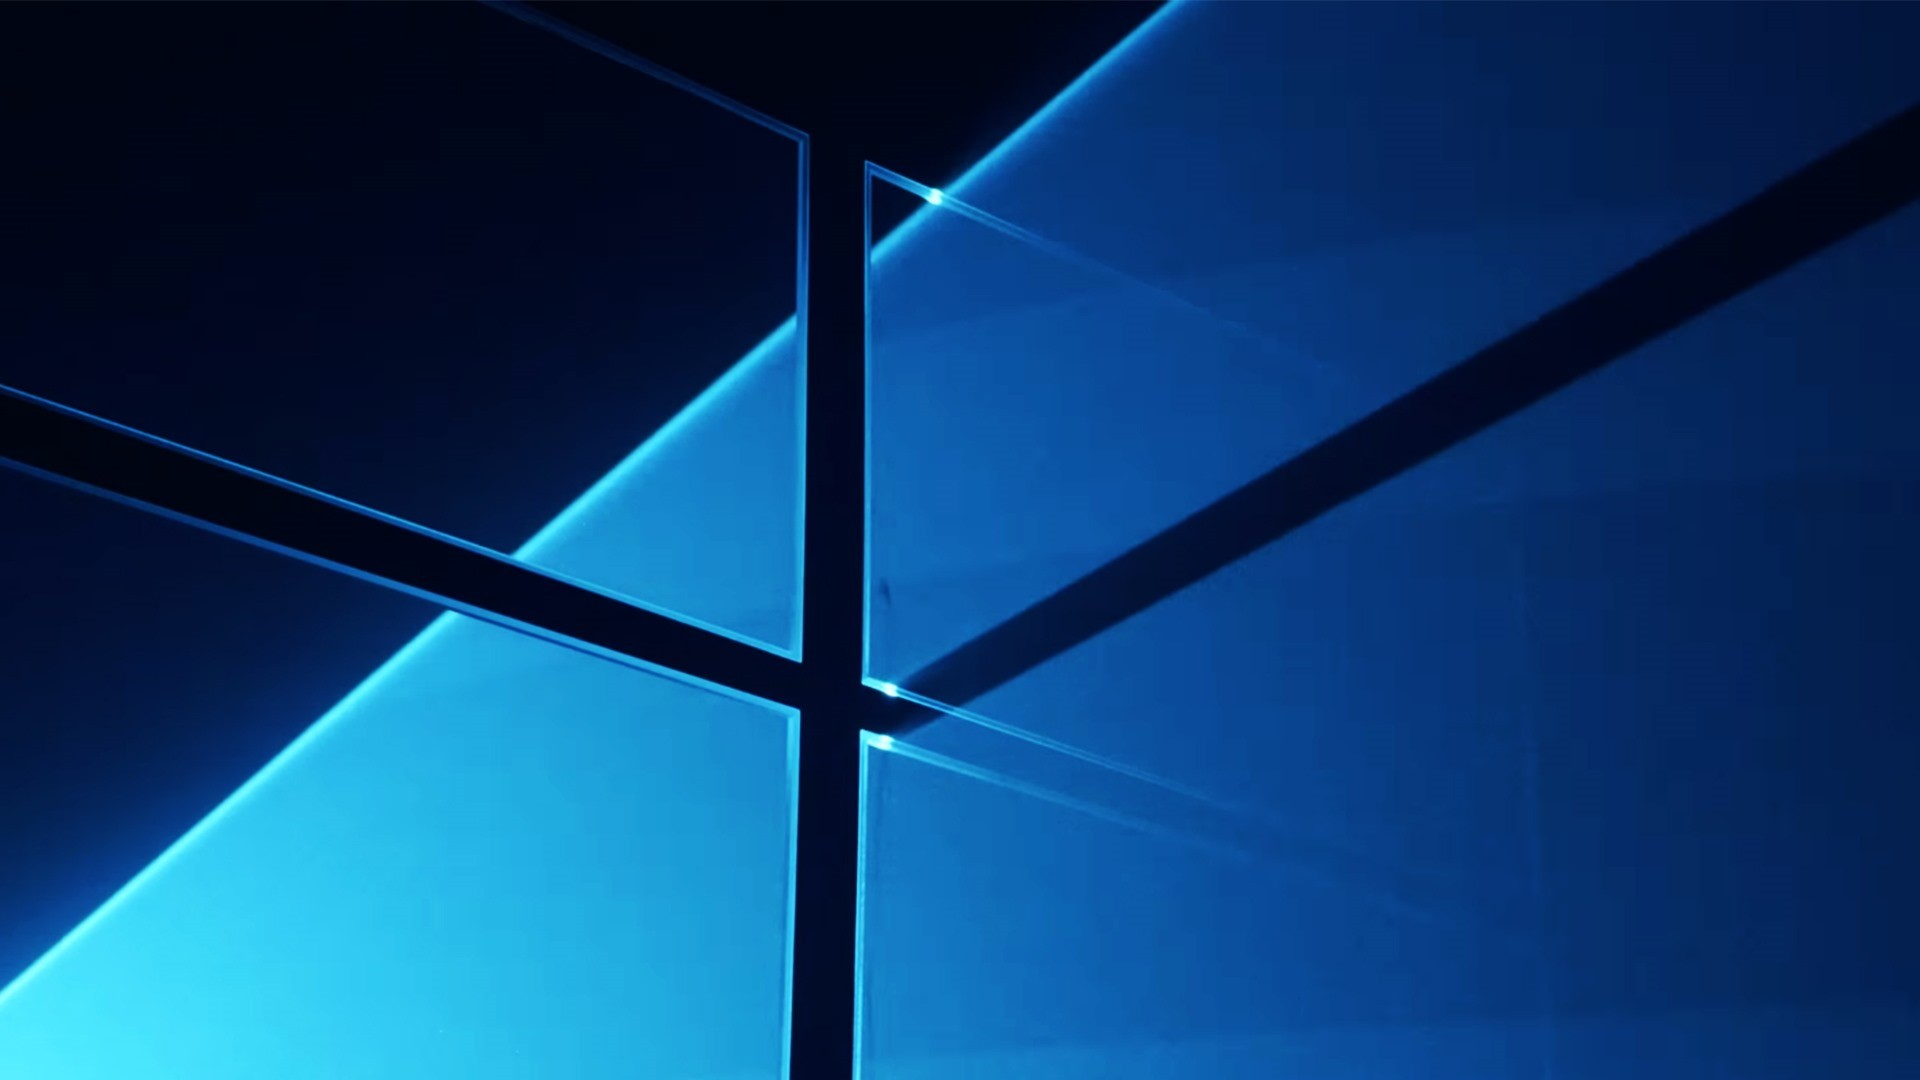 Hd desktop wallpapers windows 10 80 images for Photo ecran w10